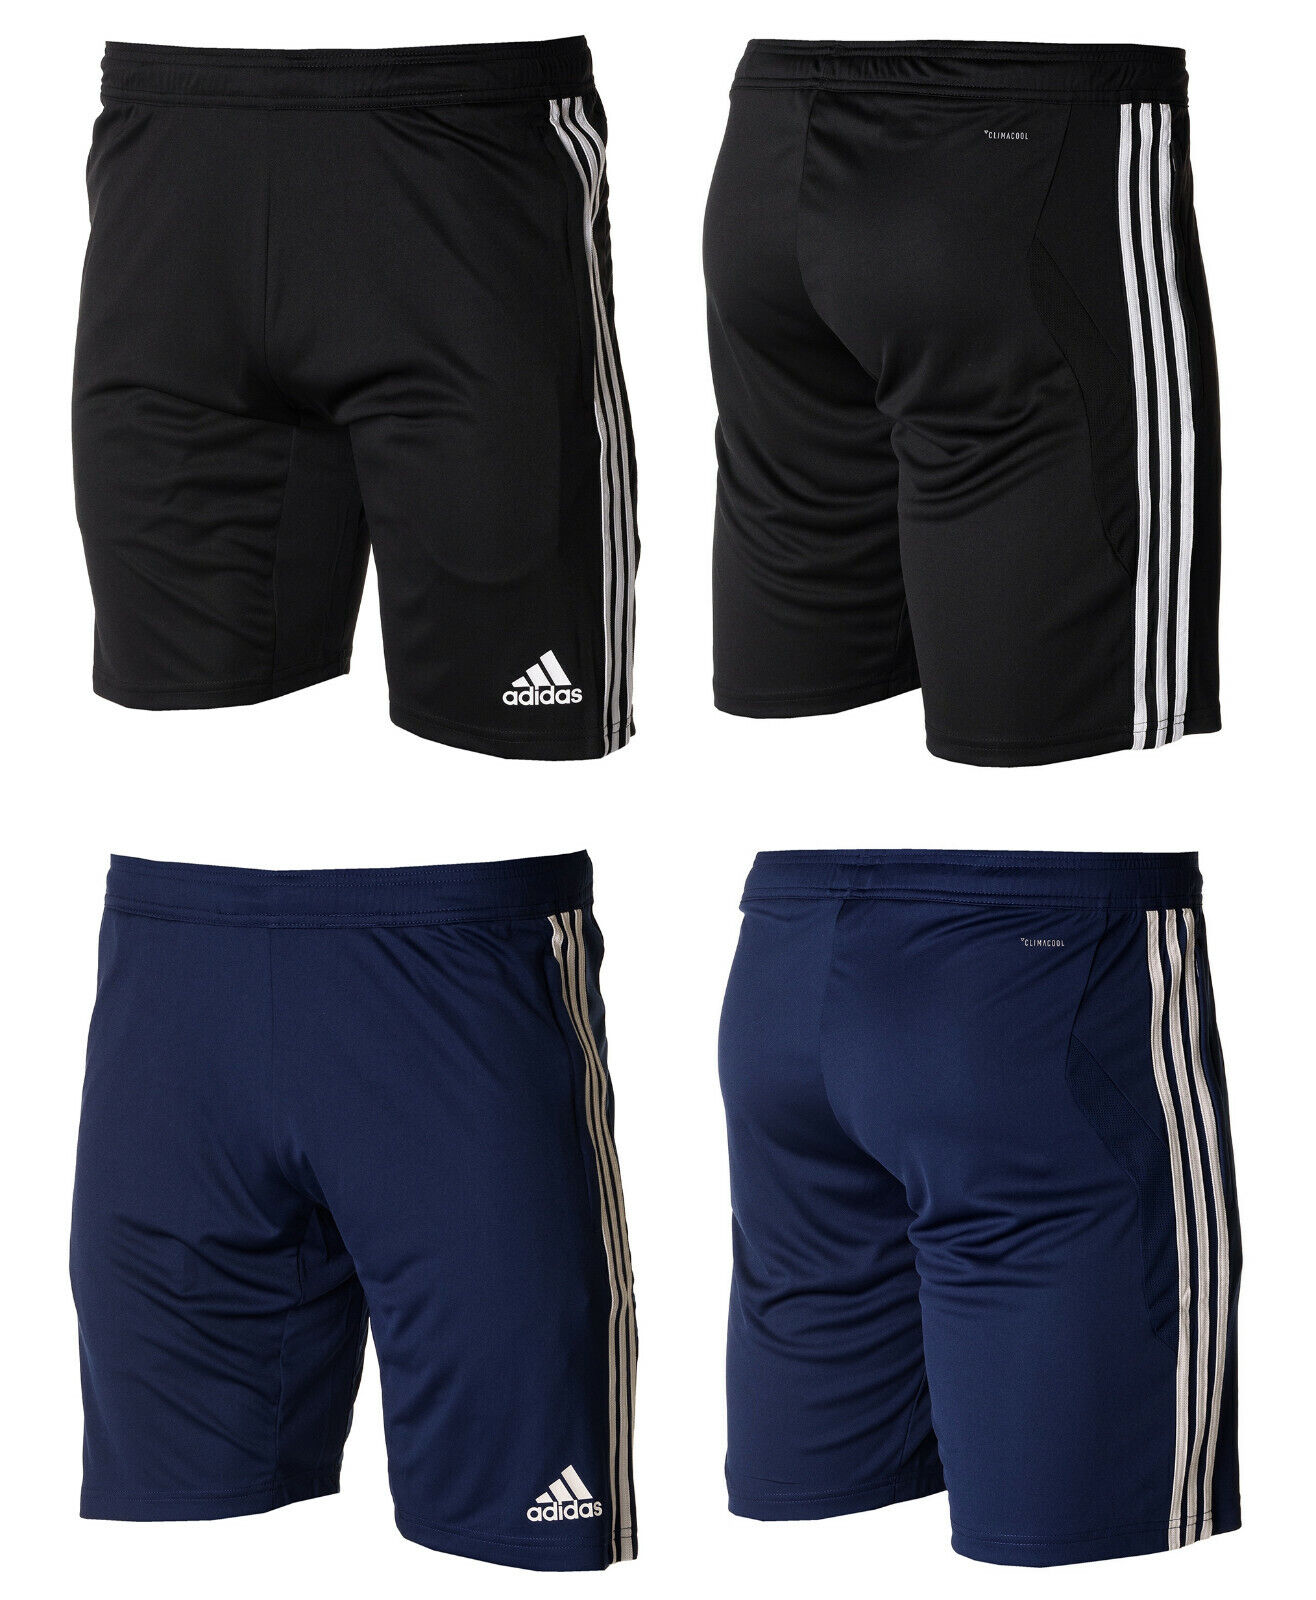 Adidas Tiro Kurze Hose Test Vergleich +++ Adidas Tiro Kurze